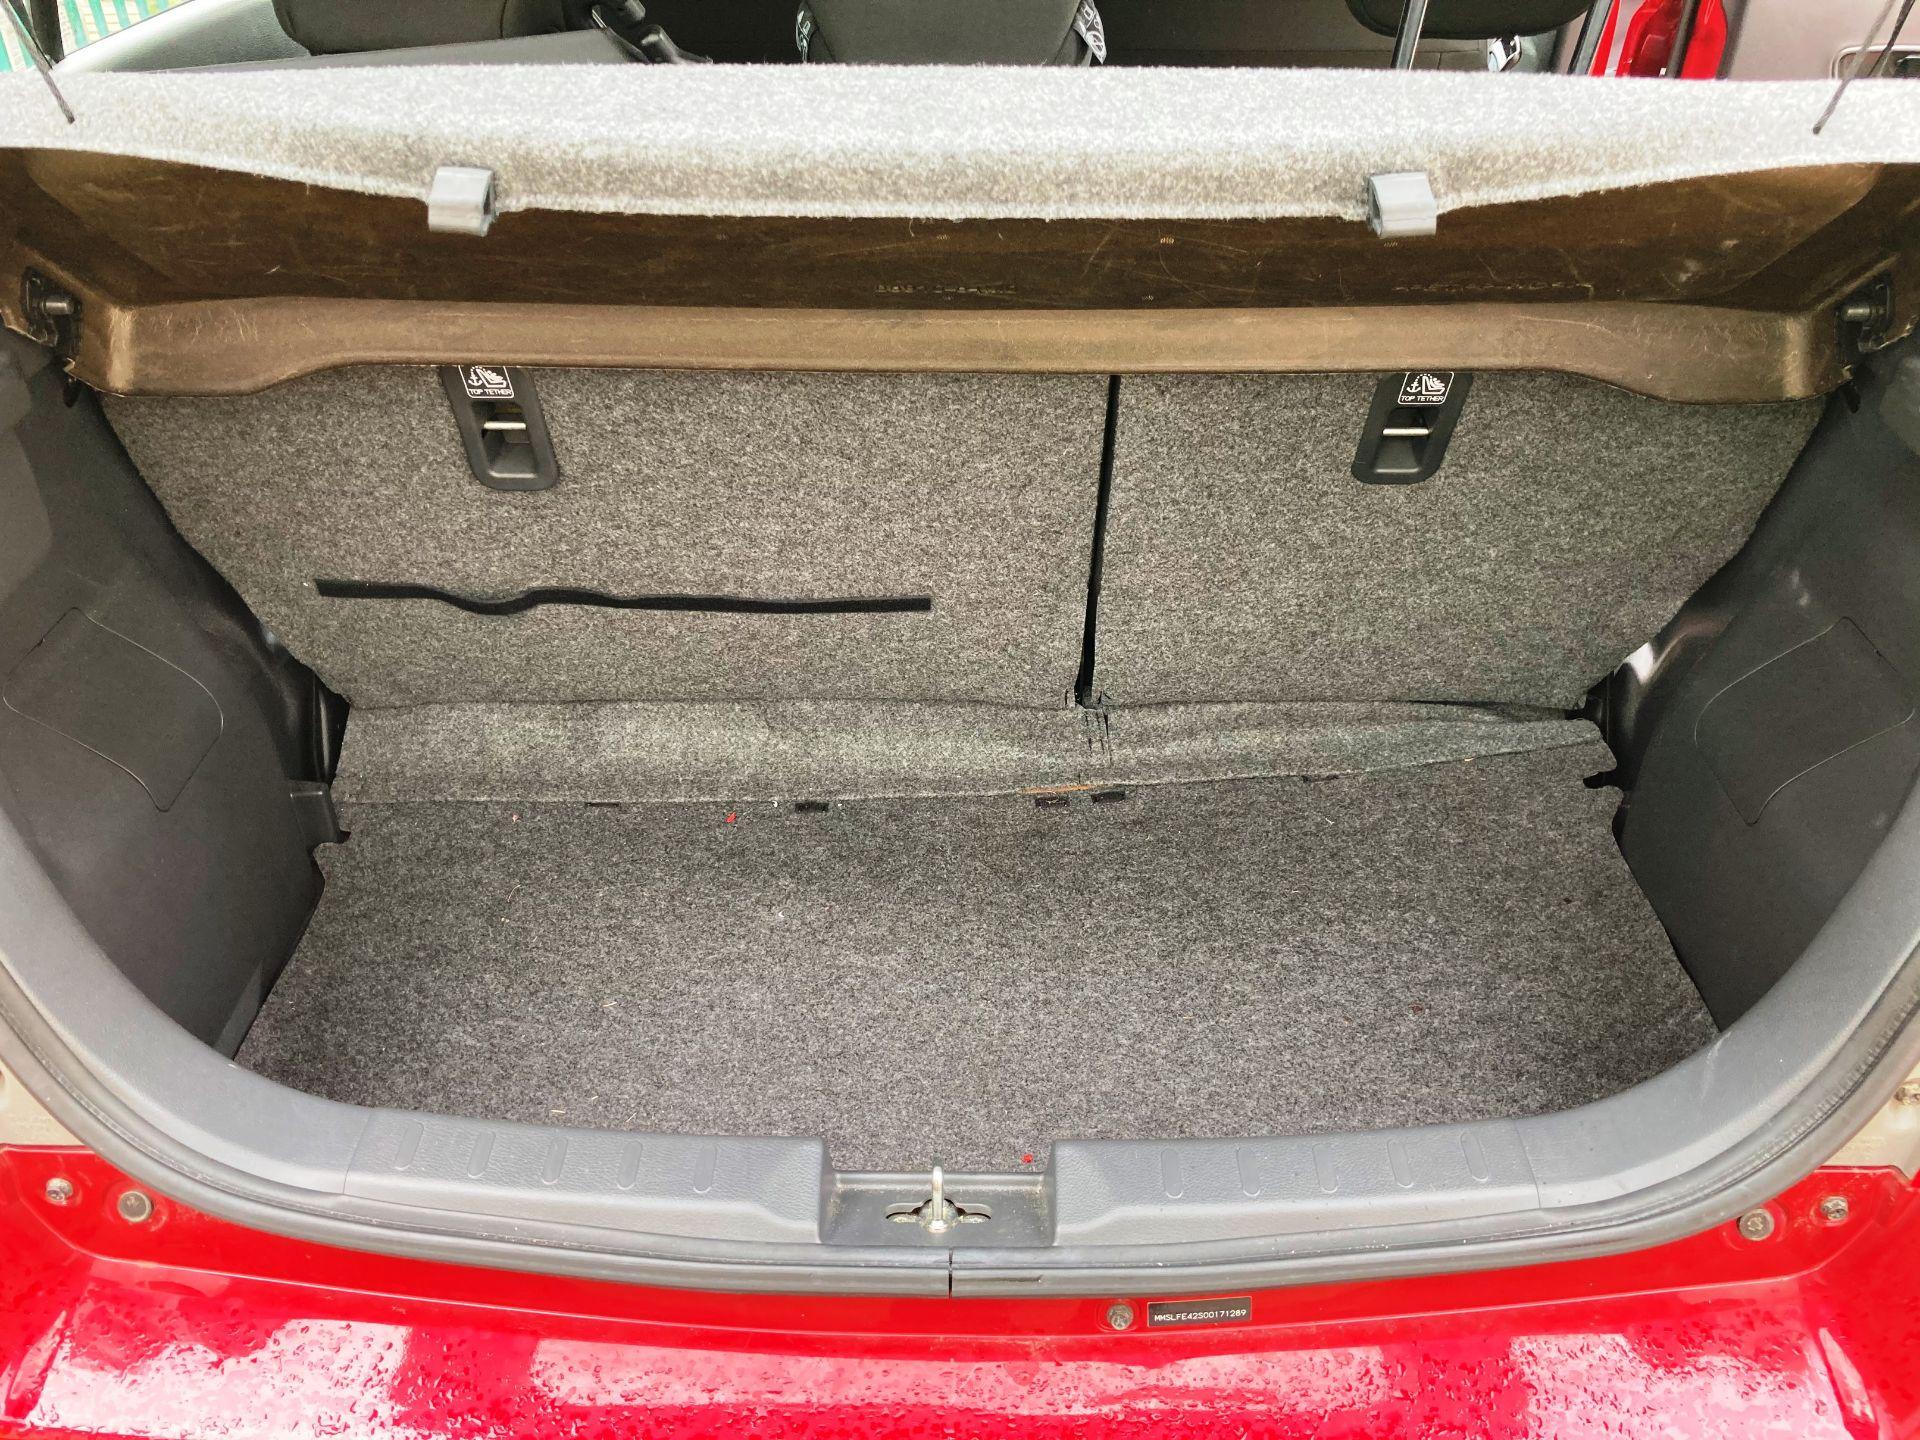 ON INSTRUCTIONS OF THE INSOLVENCY SERVICE SUZUKI CELERIO SZ2 5 door hatchback - petrol - red Reg - Image 15 of 15